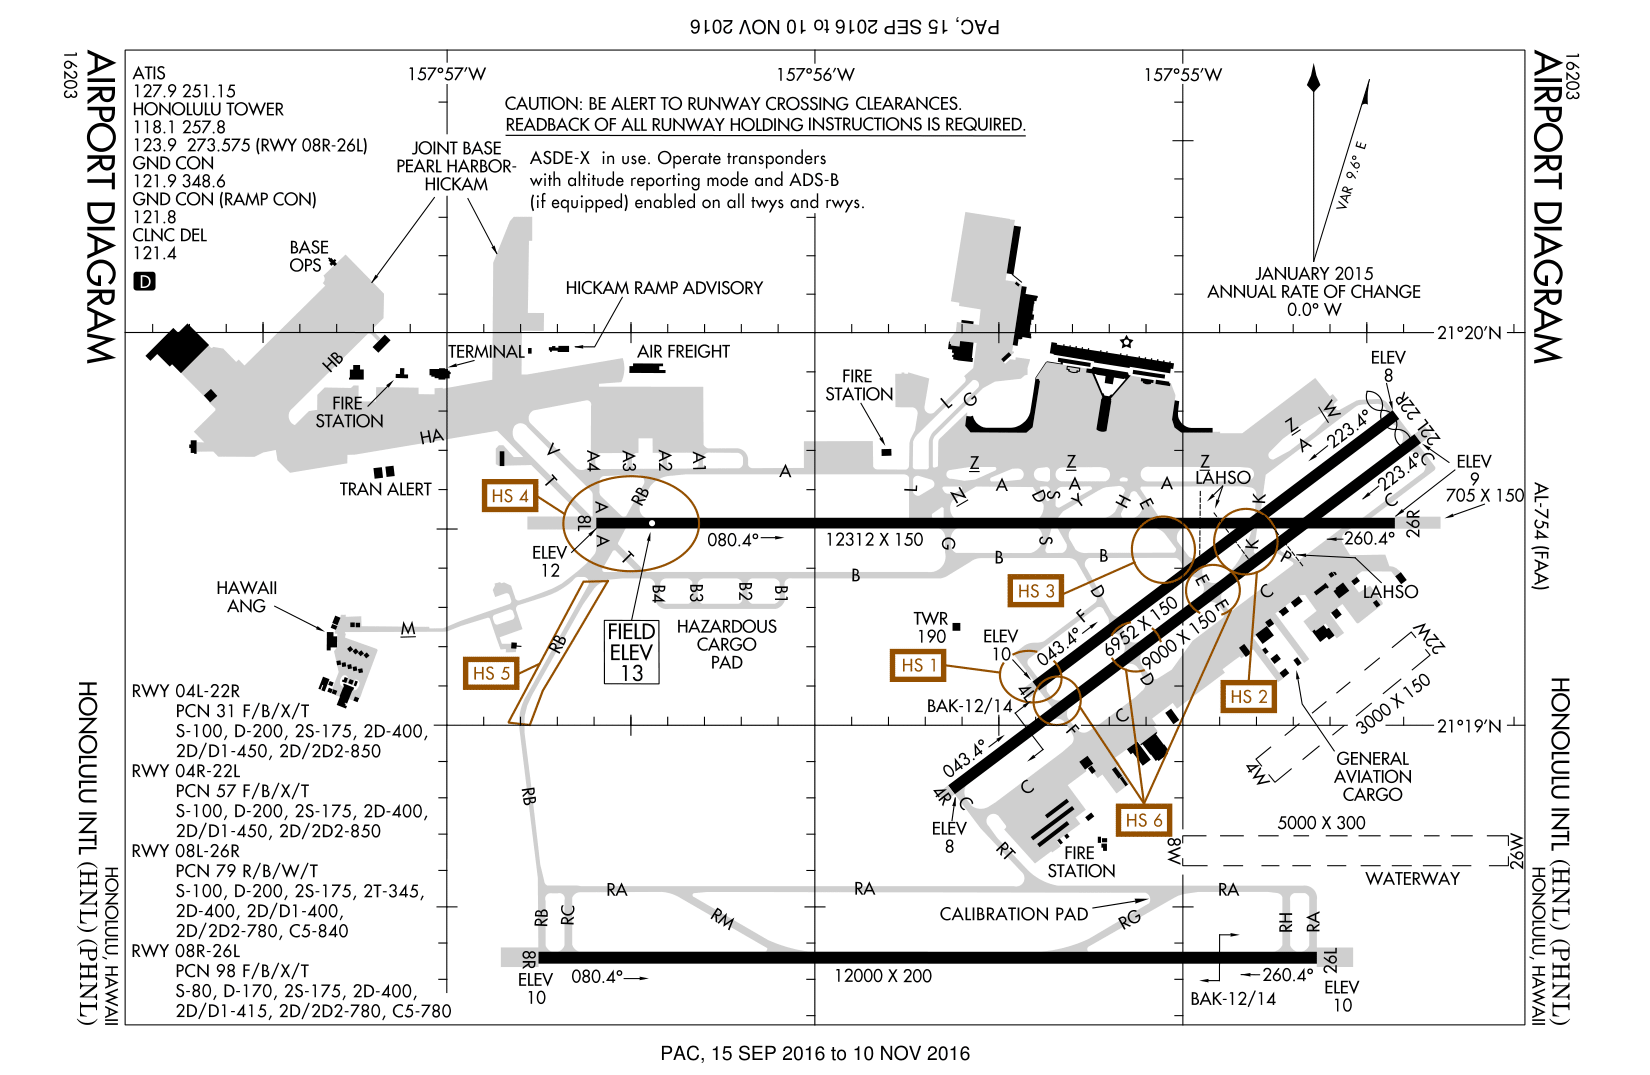 file type gif 84721switch diagramgif 44 kb 3 views schematic rh aerofitness co